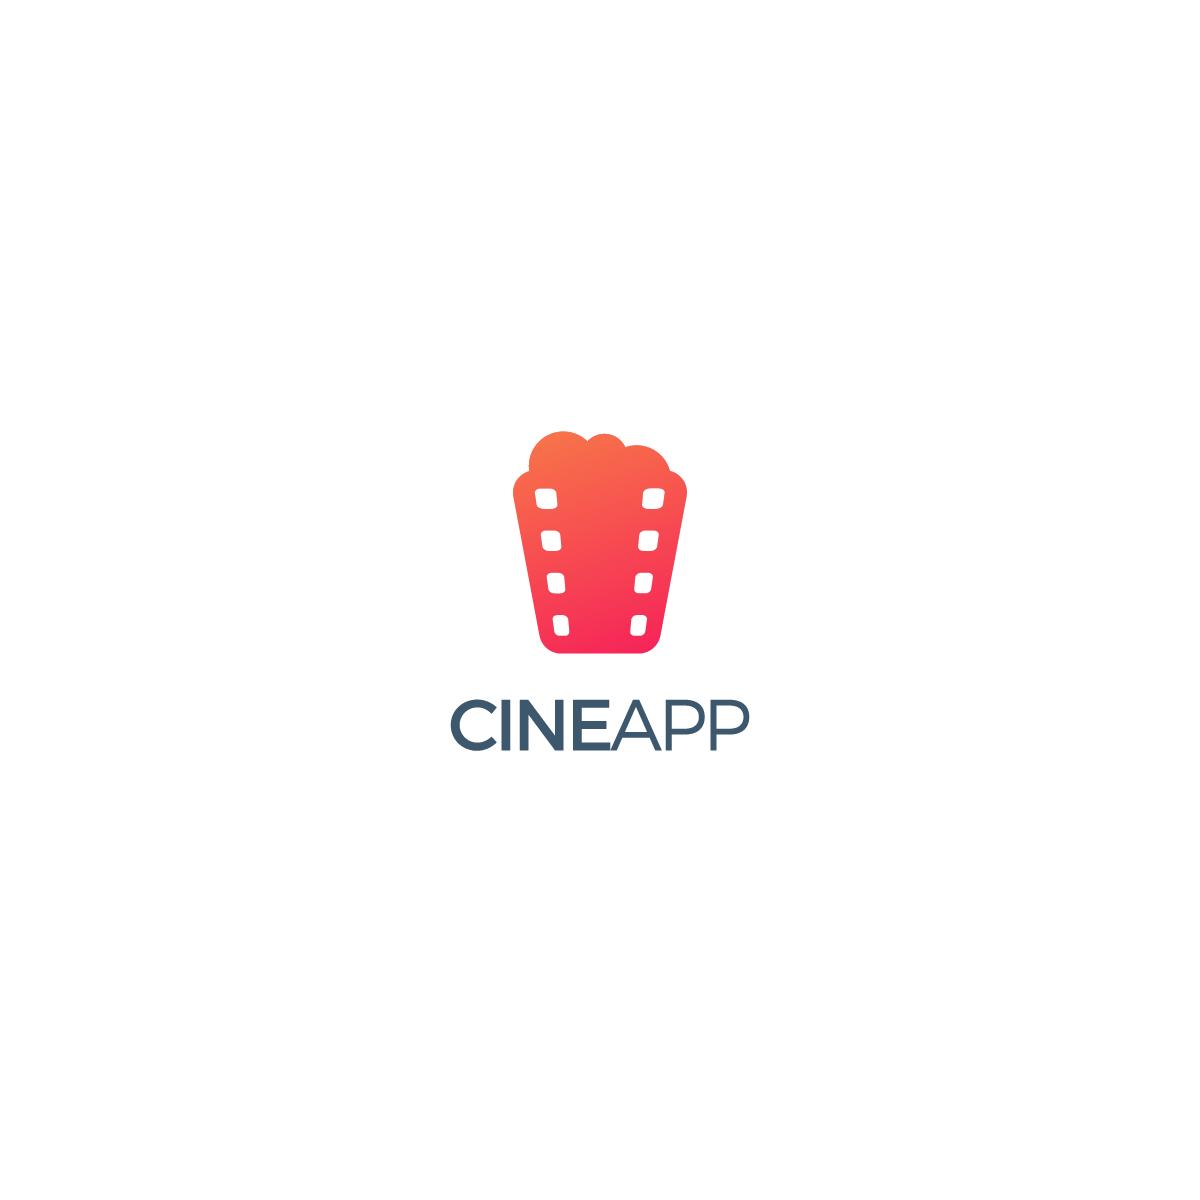 Create a fancy logo for the best movie-ticket app